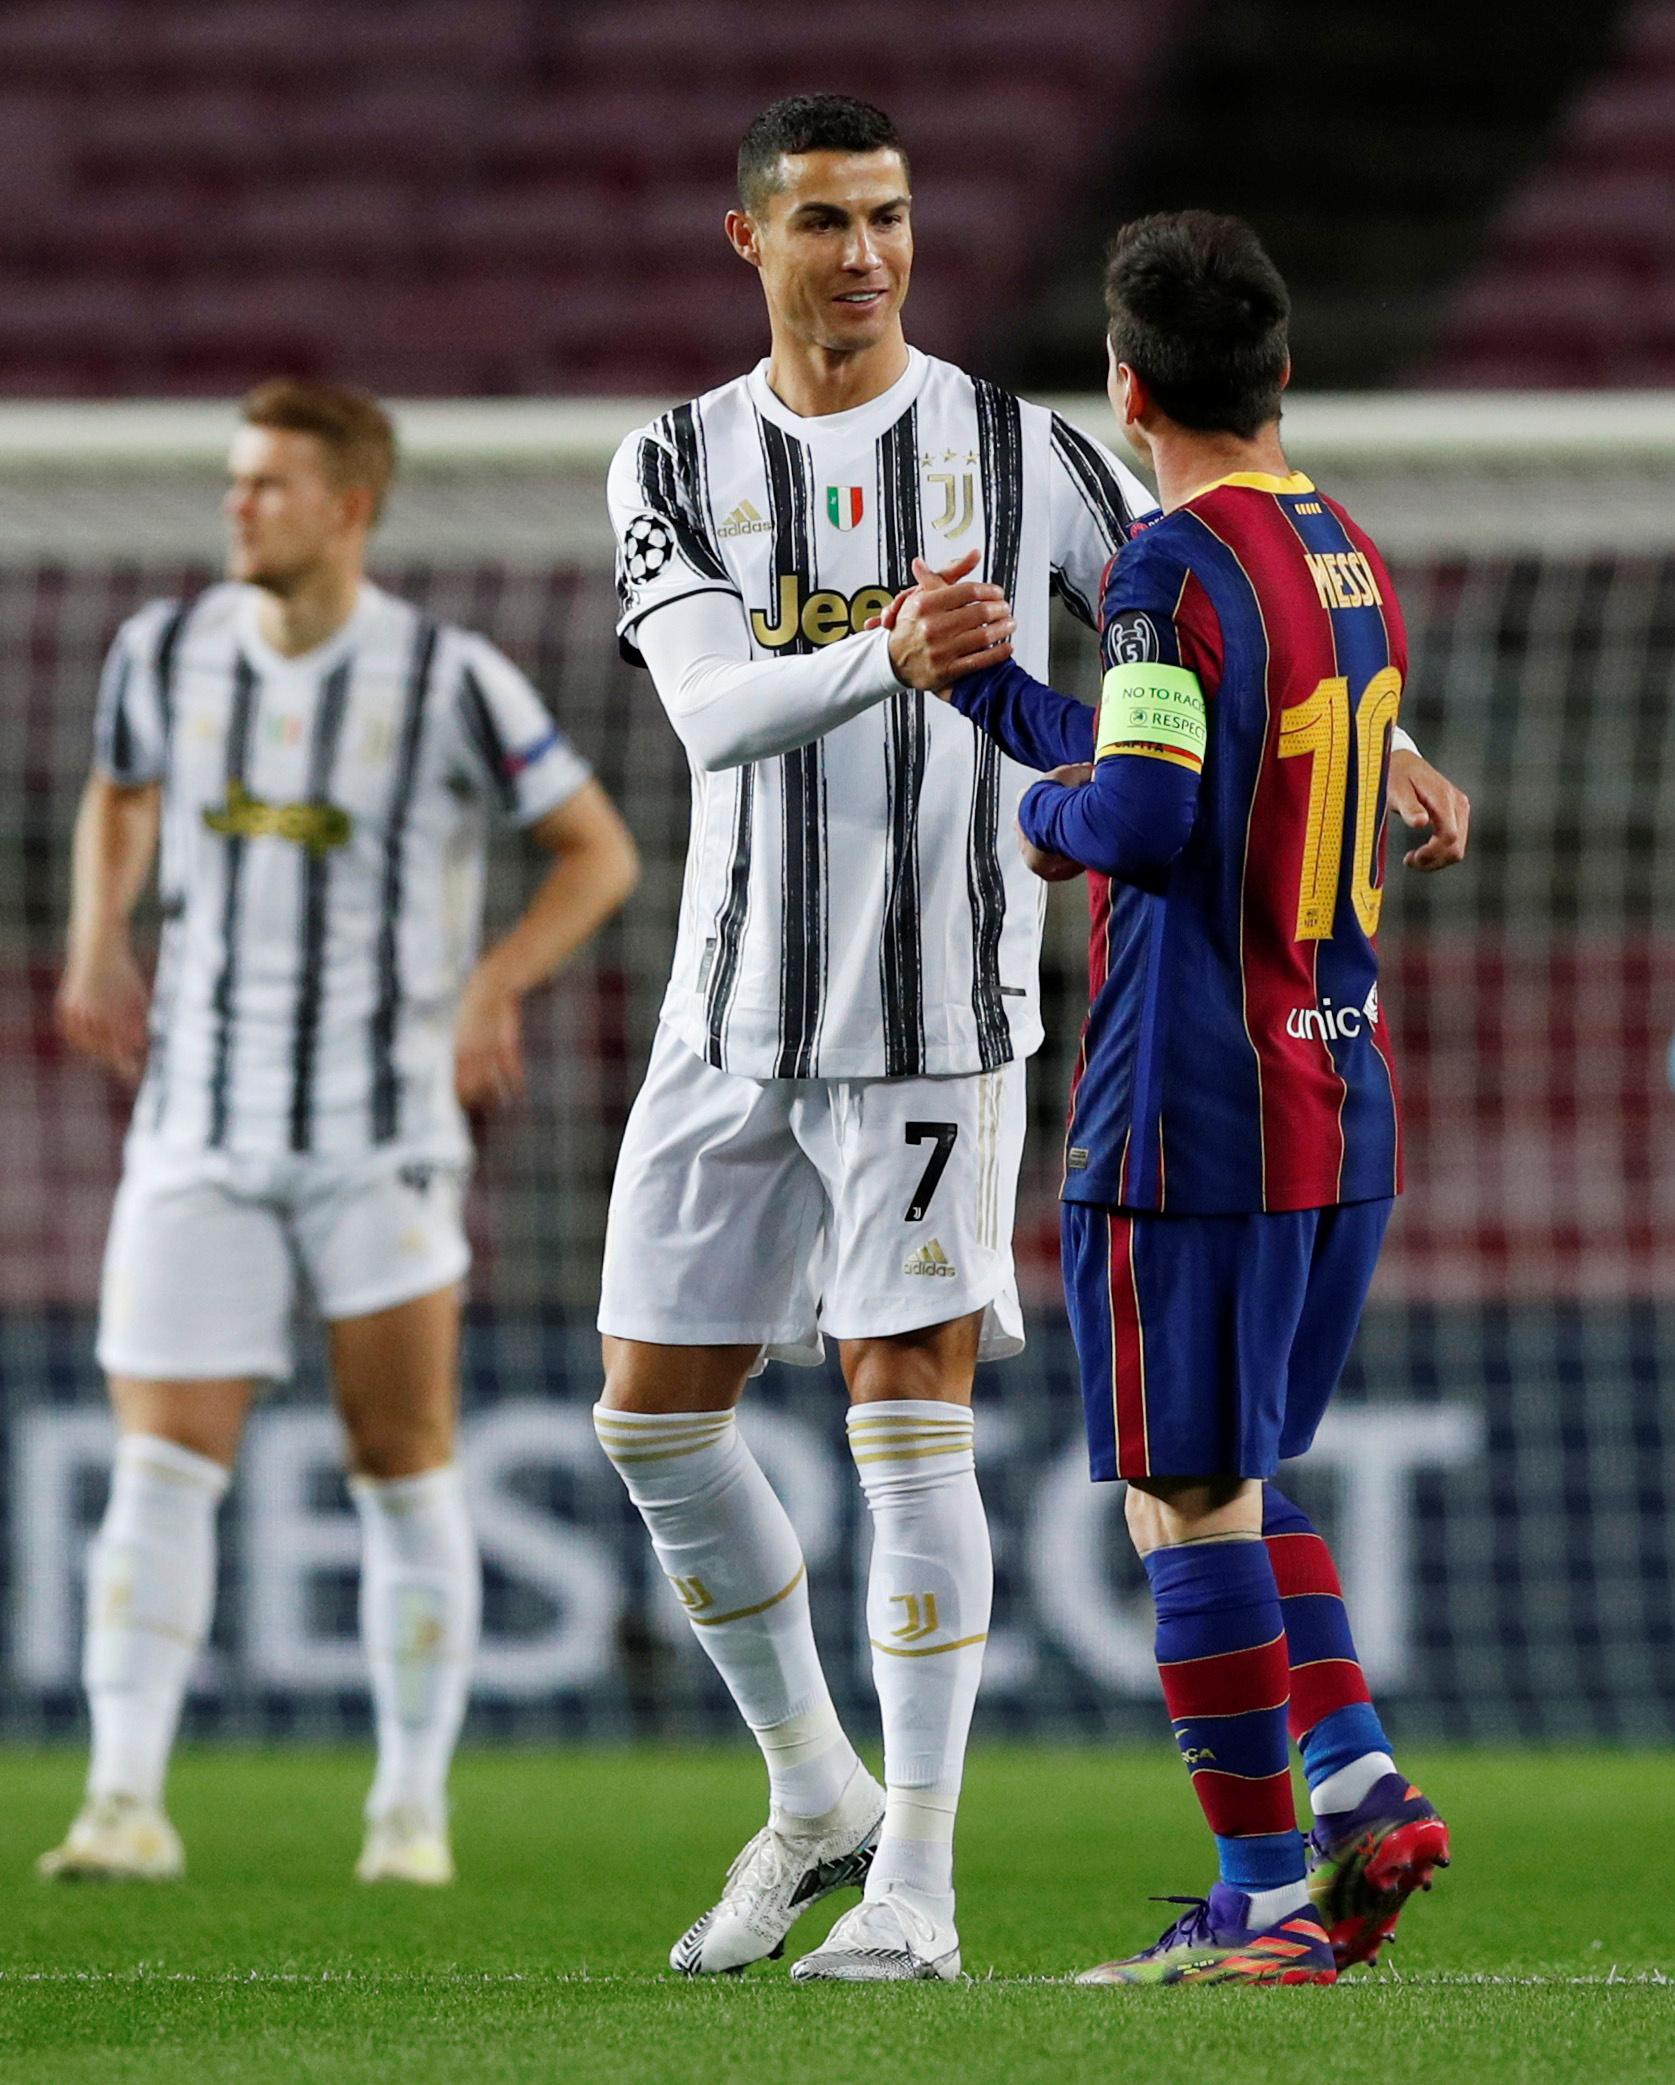 FIFA «The Best»: Ο Κριστιάνο Ρονάλντο ψήφισε Μέσι, ο Αργεντινός «κοίταξε» αλλού